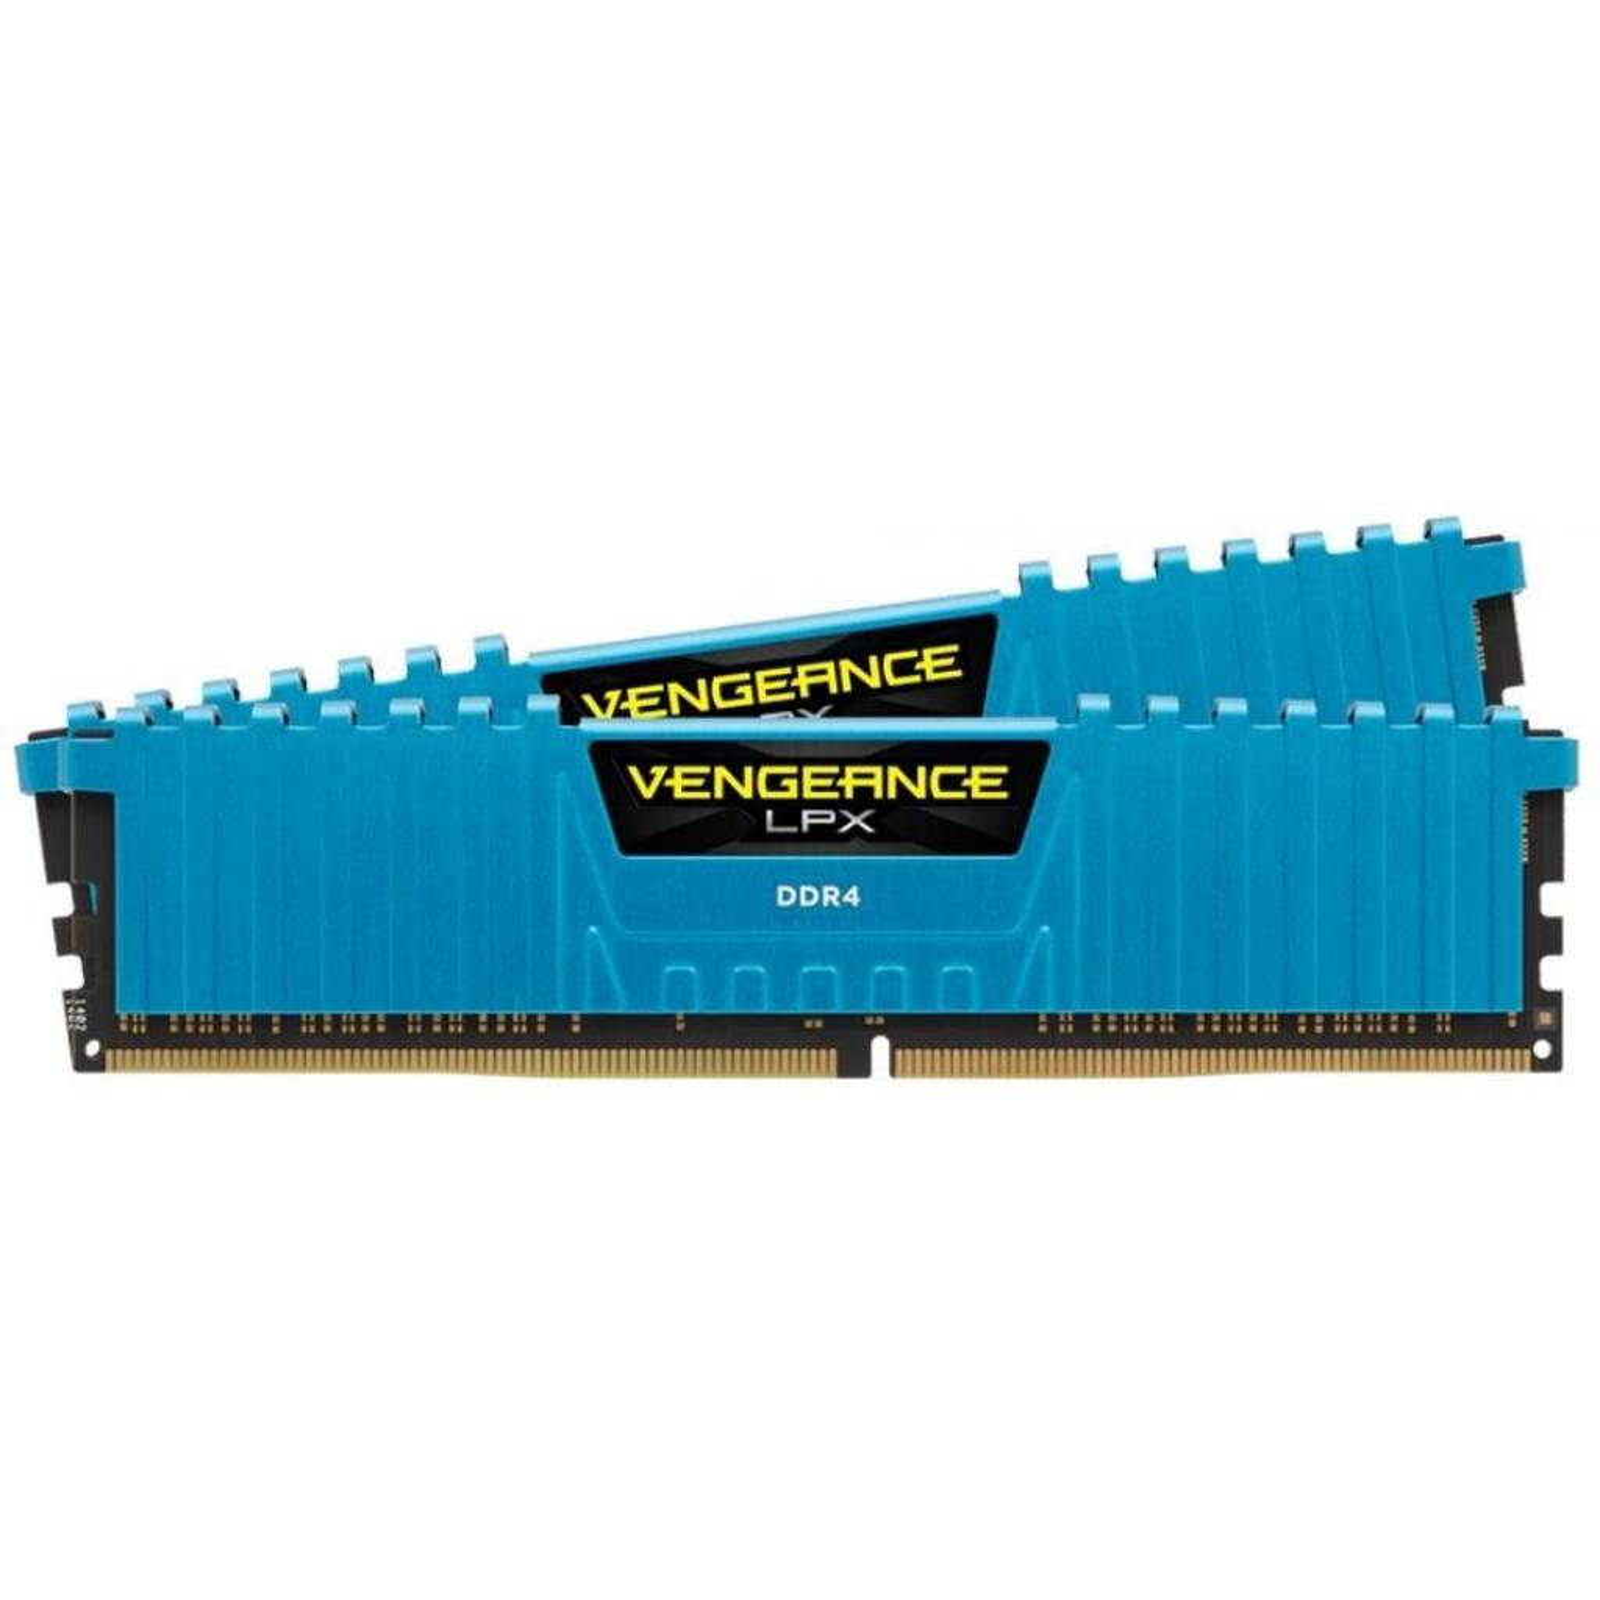 Модуль памяти для компьютера DDR4 16GB (2x8GB) 3000 MHz Vengeance LPX Blue Corsair (CMK16GX4M2B3000C15B) изображение 2